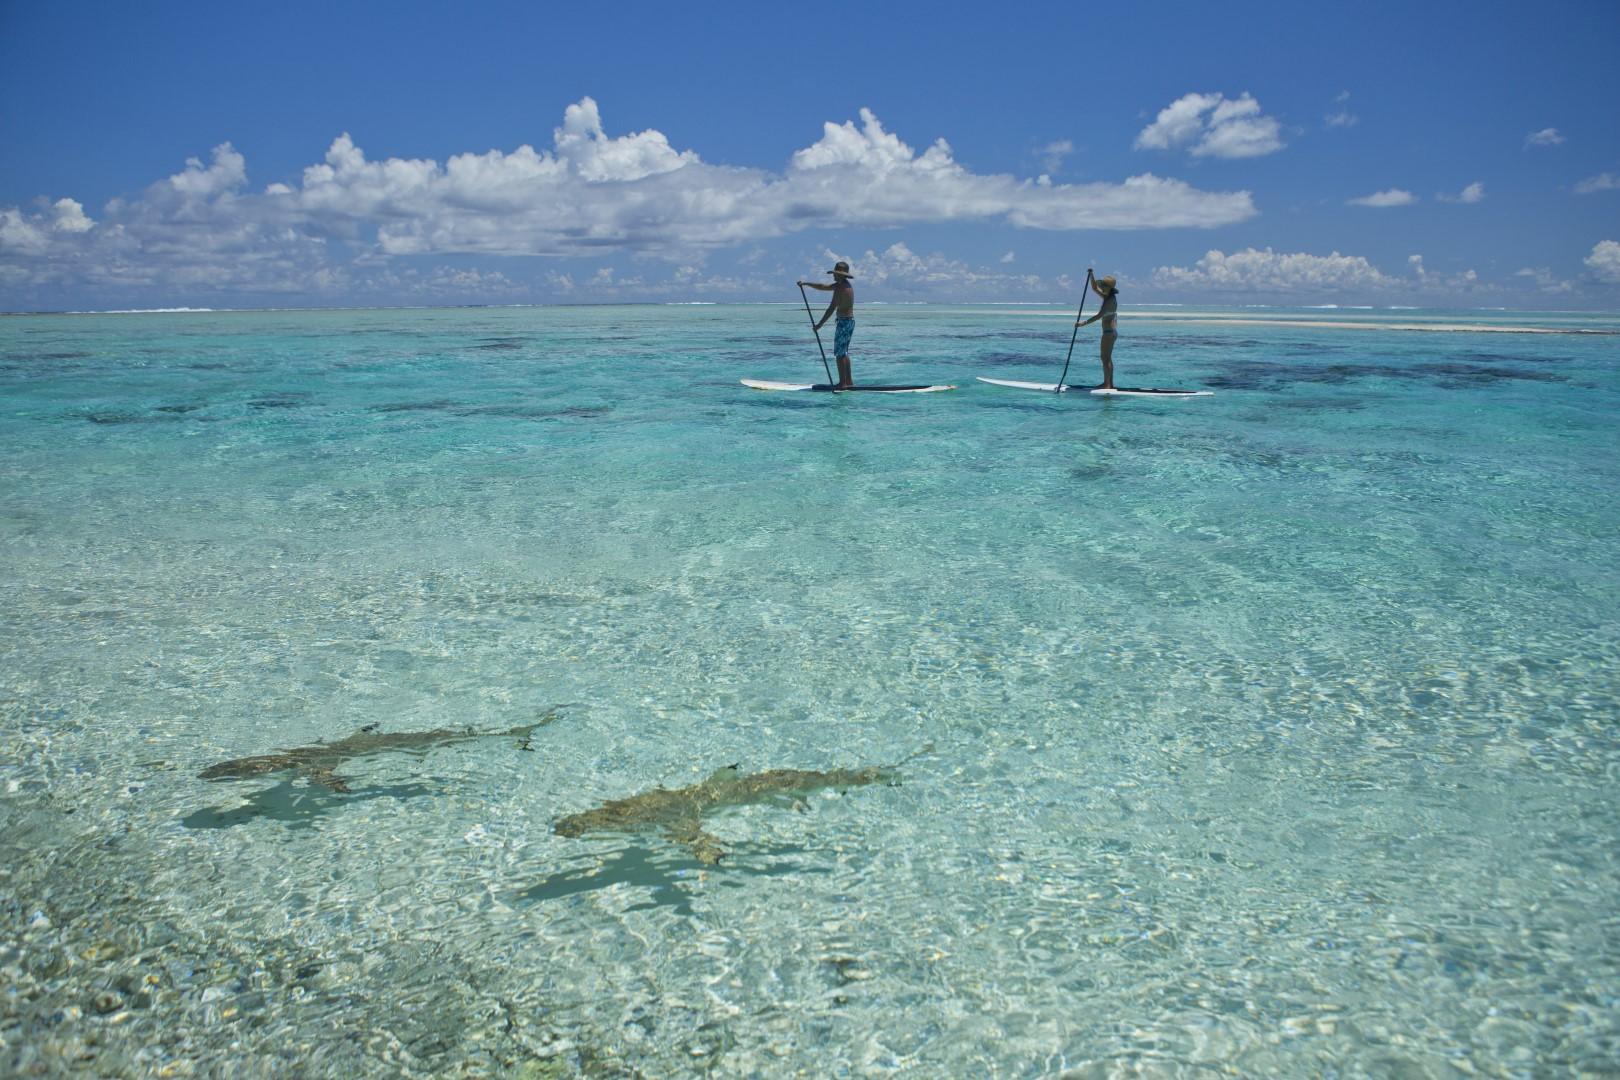 Le isole di Tahiti hanno una regina: Tikehau